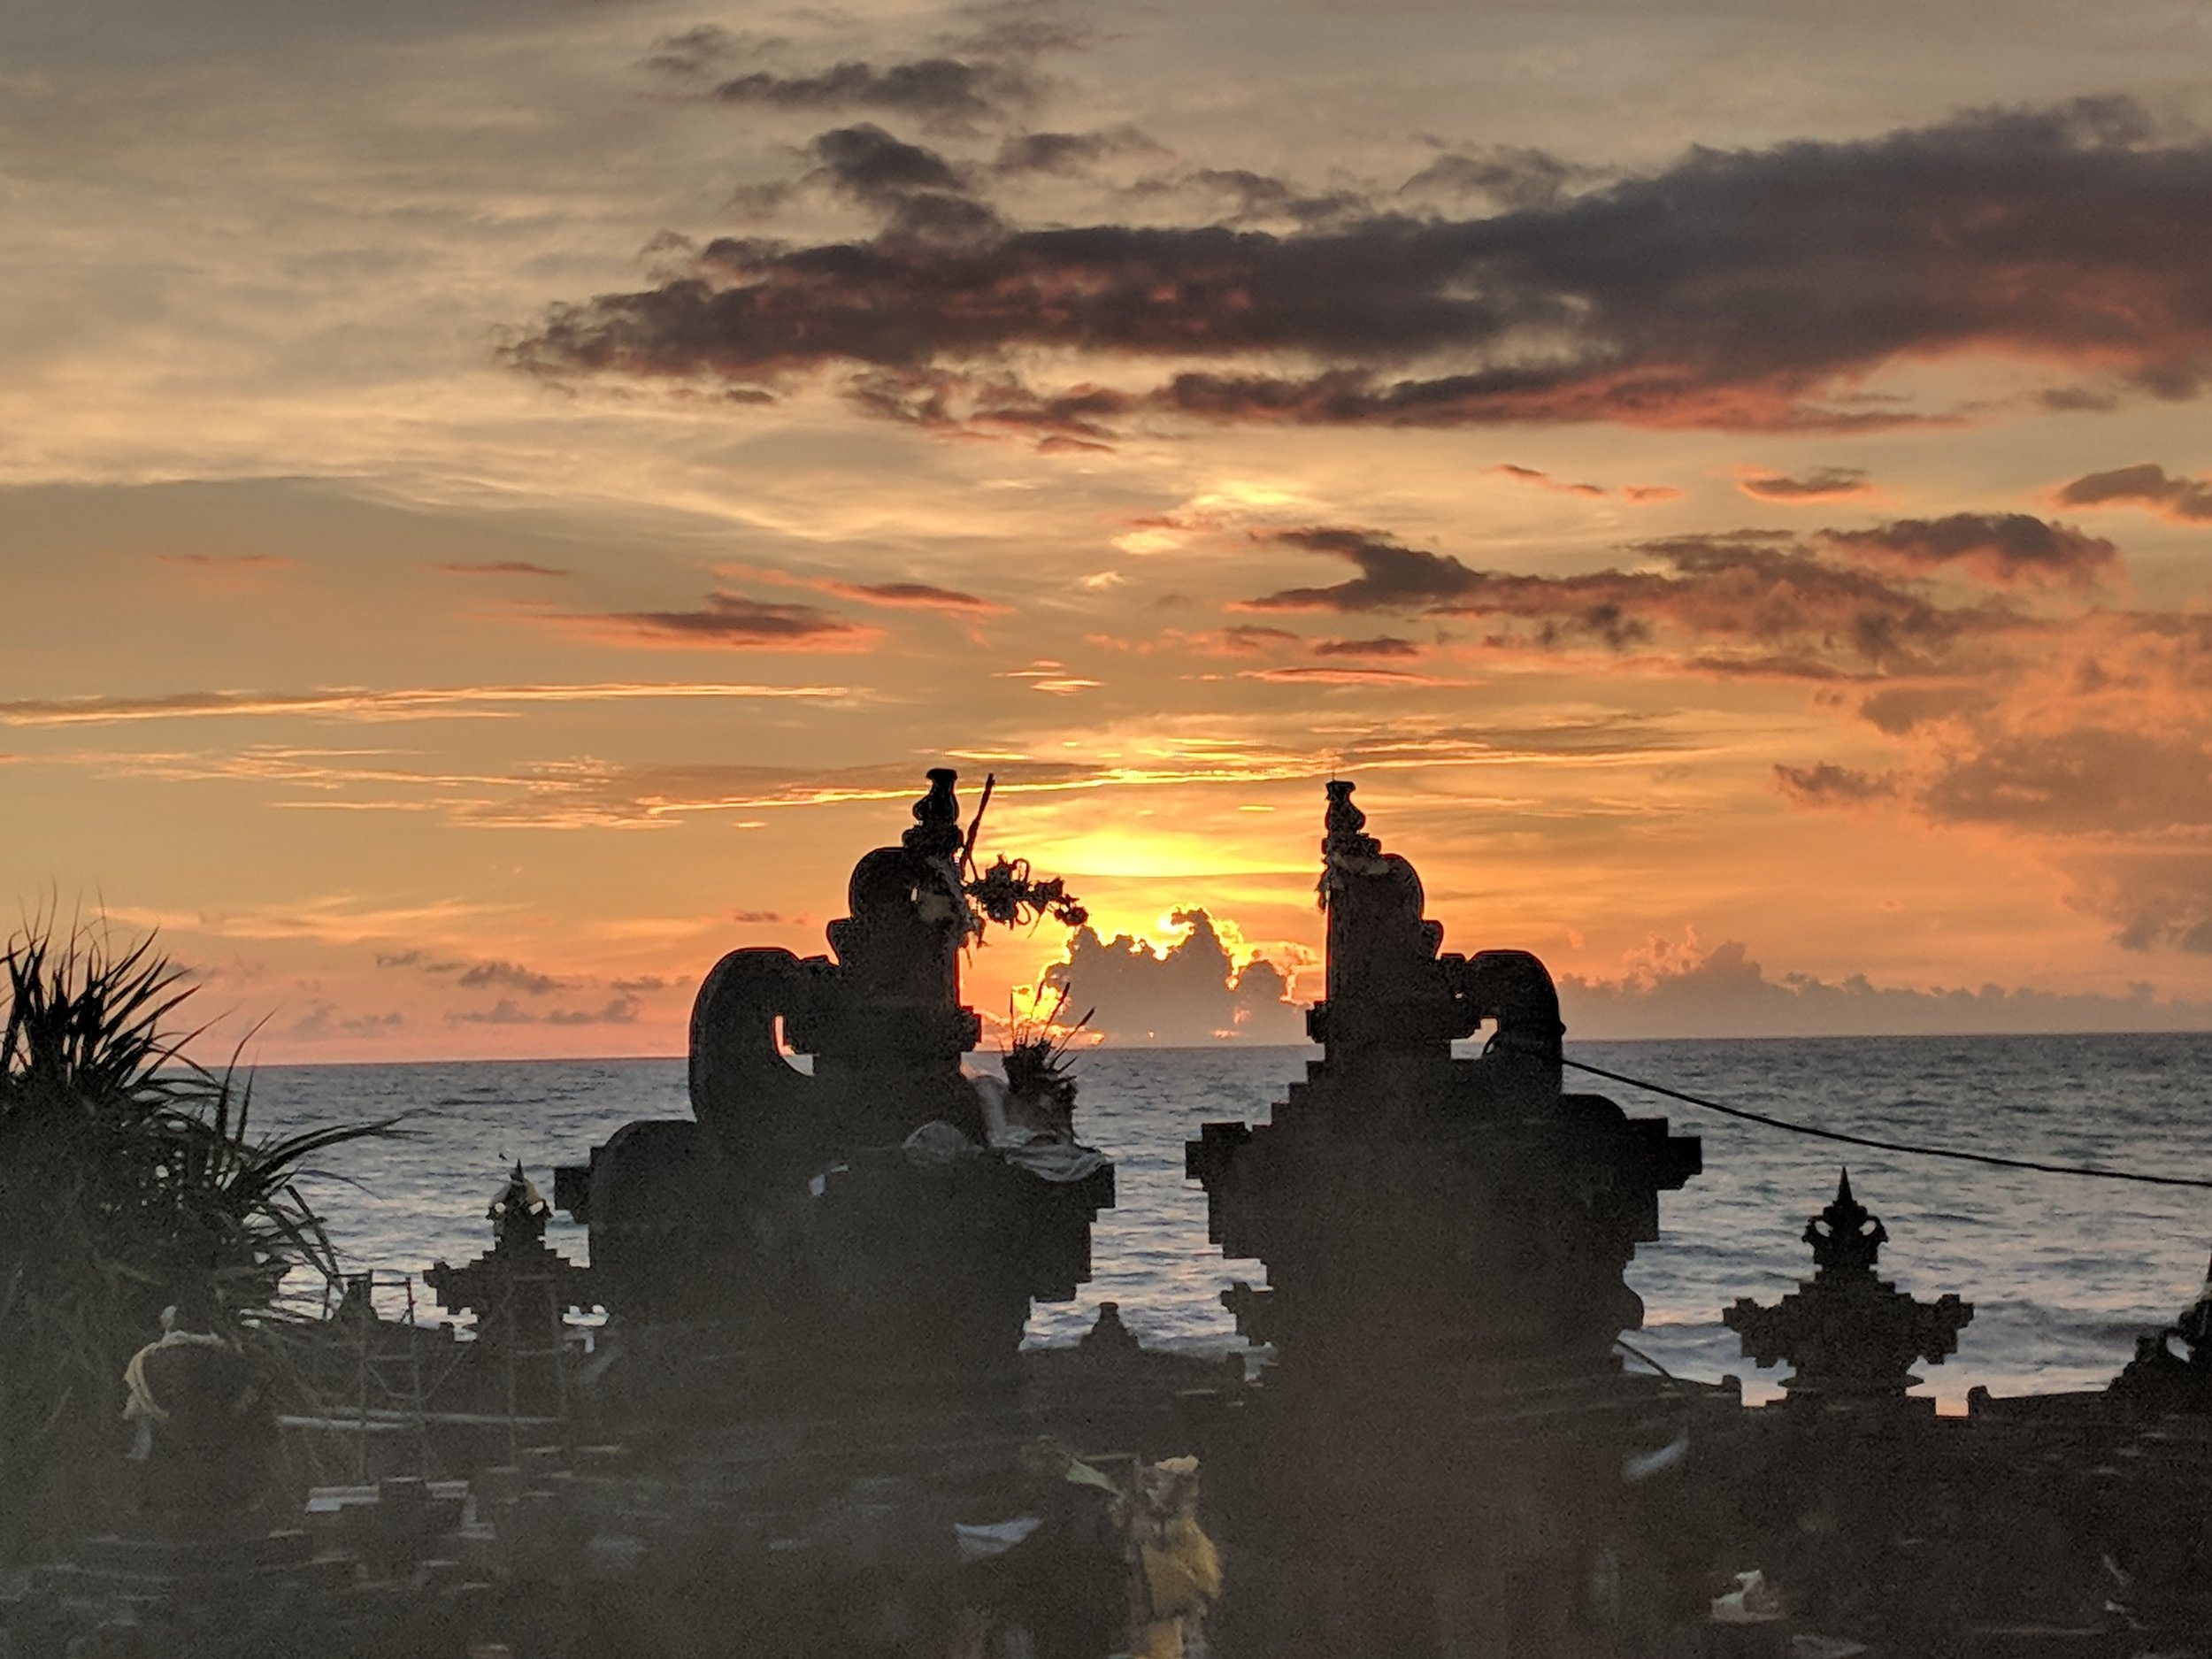 Canggu beach in Bali, Indonesia. boldlygotravel.com